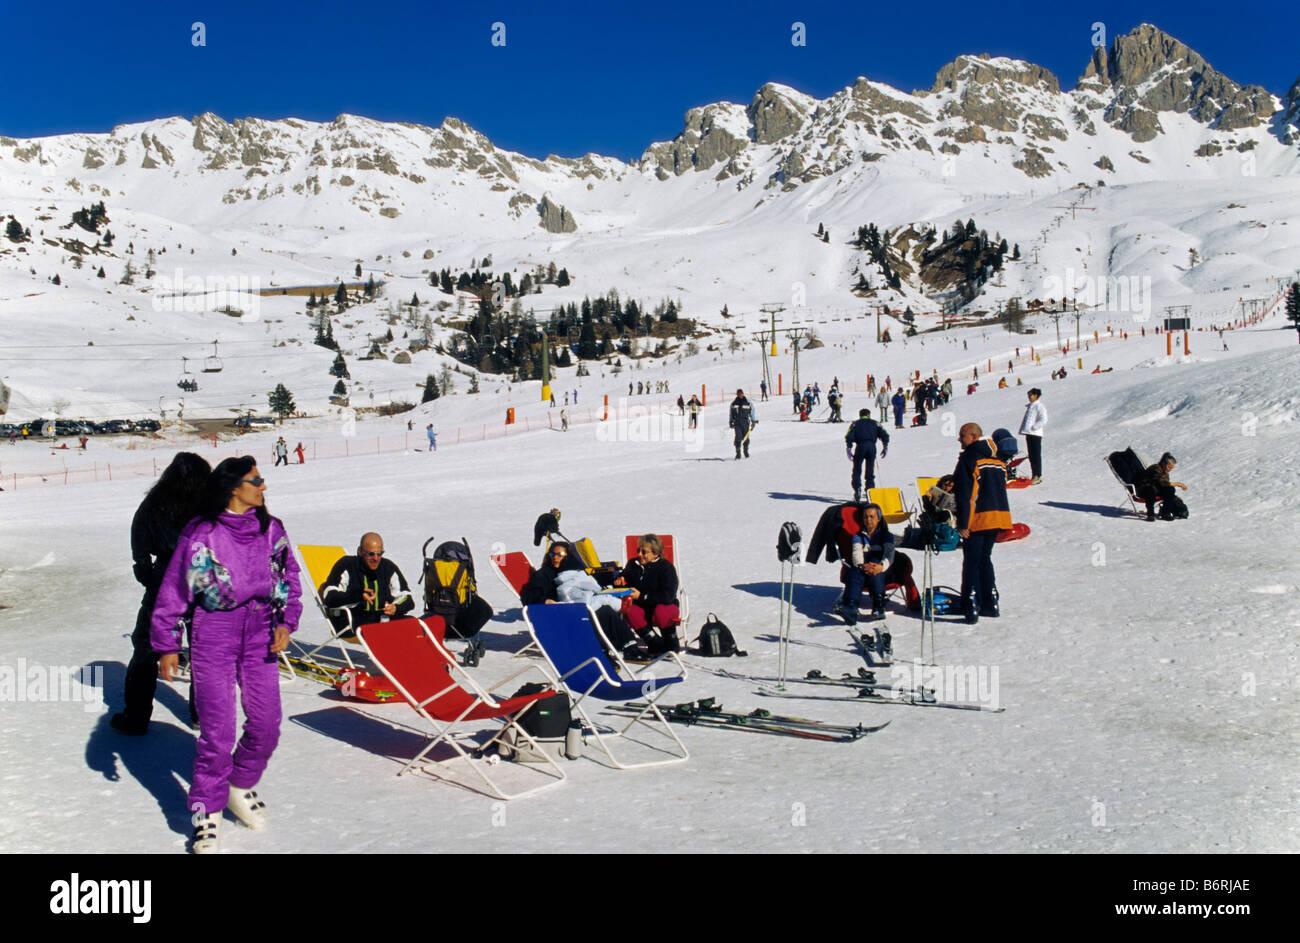 Skiers relaxing at skiing area at Passo di San Pelegrino in Marmolada mountain group Dolomites Trentino Alto Adige Stock Photo